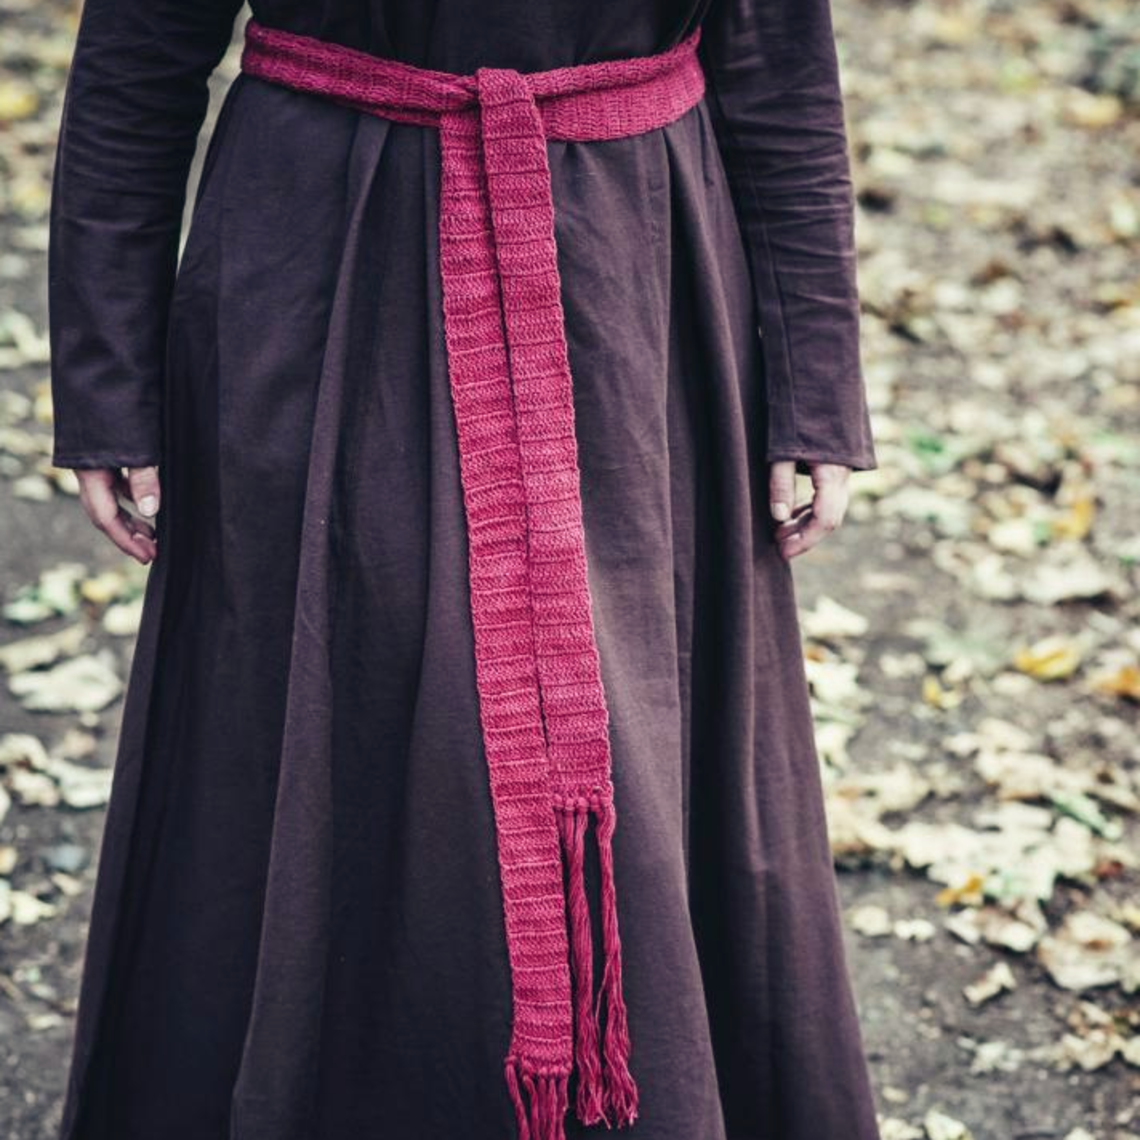 Leonardo Carbone Cintura banda Colet, negro